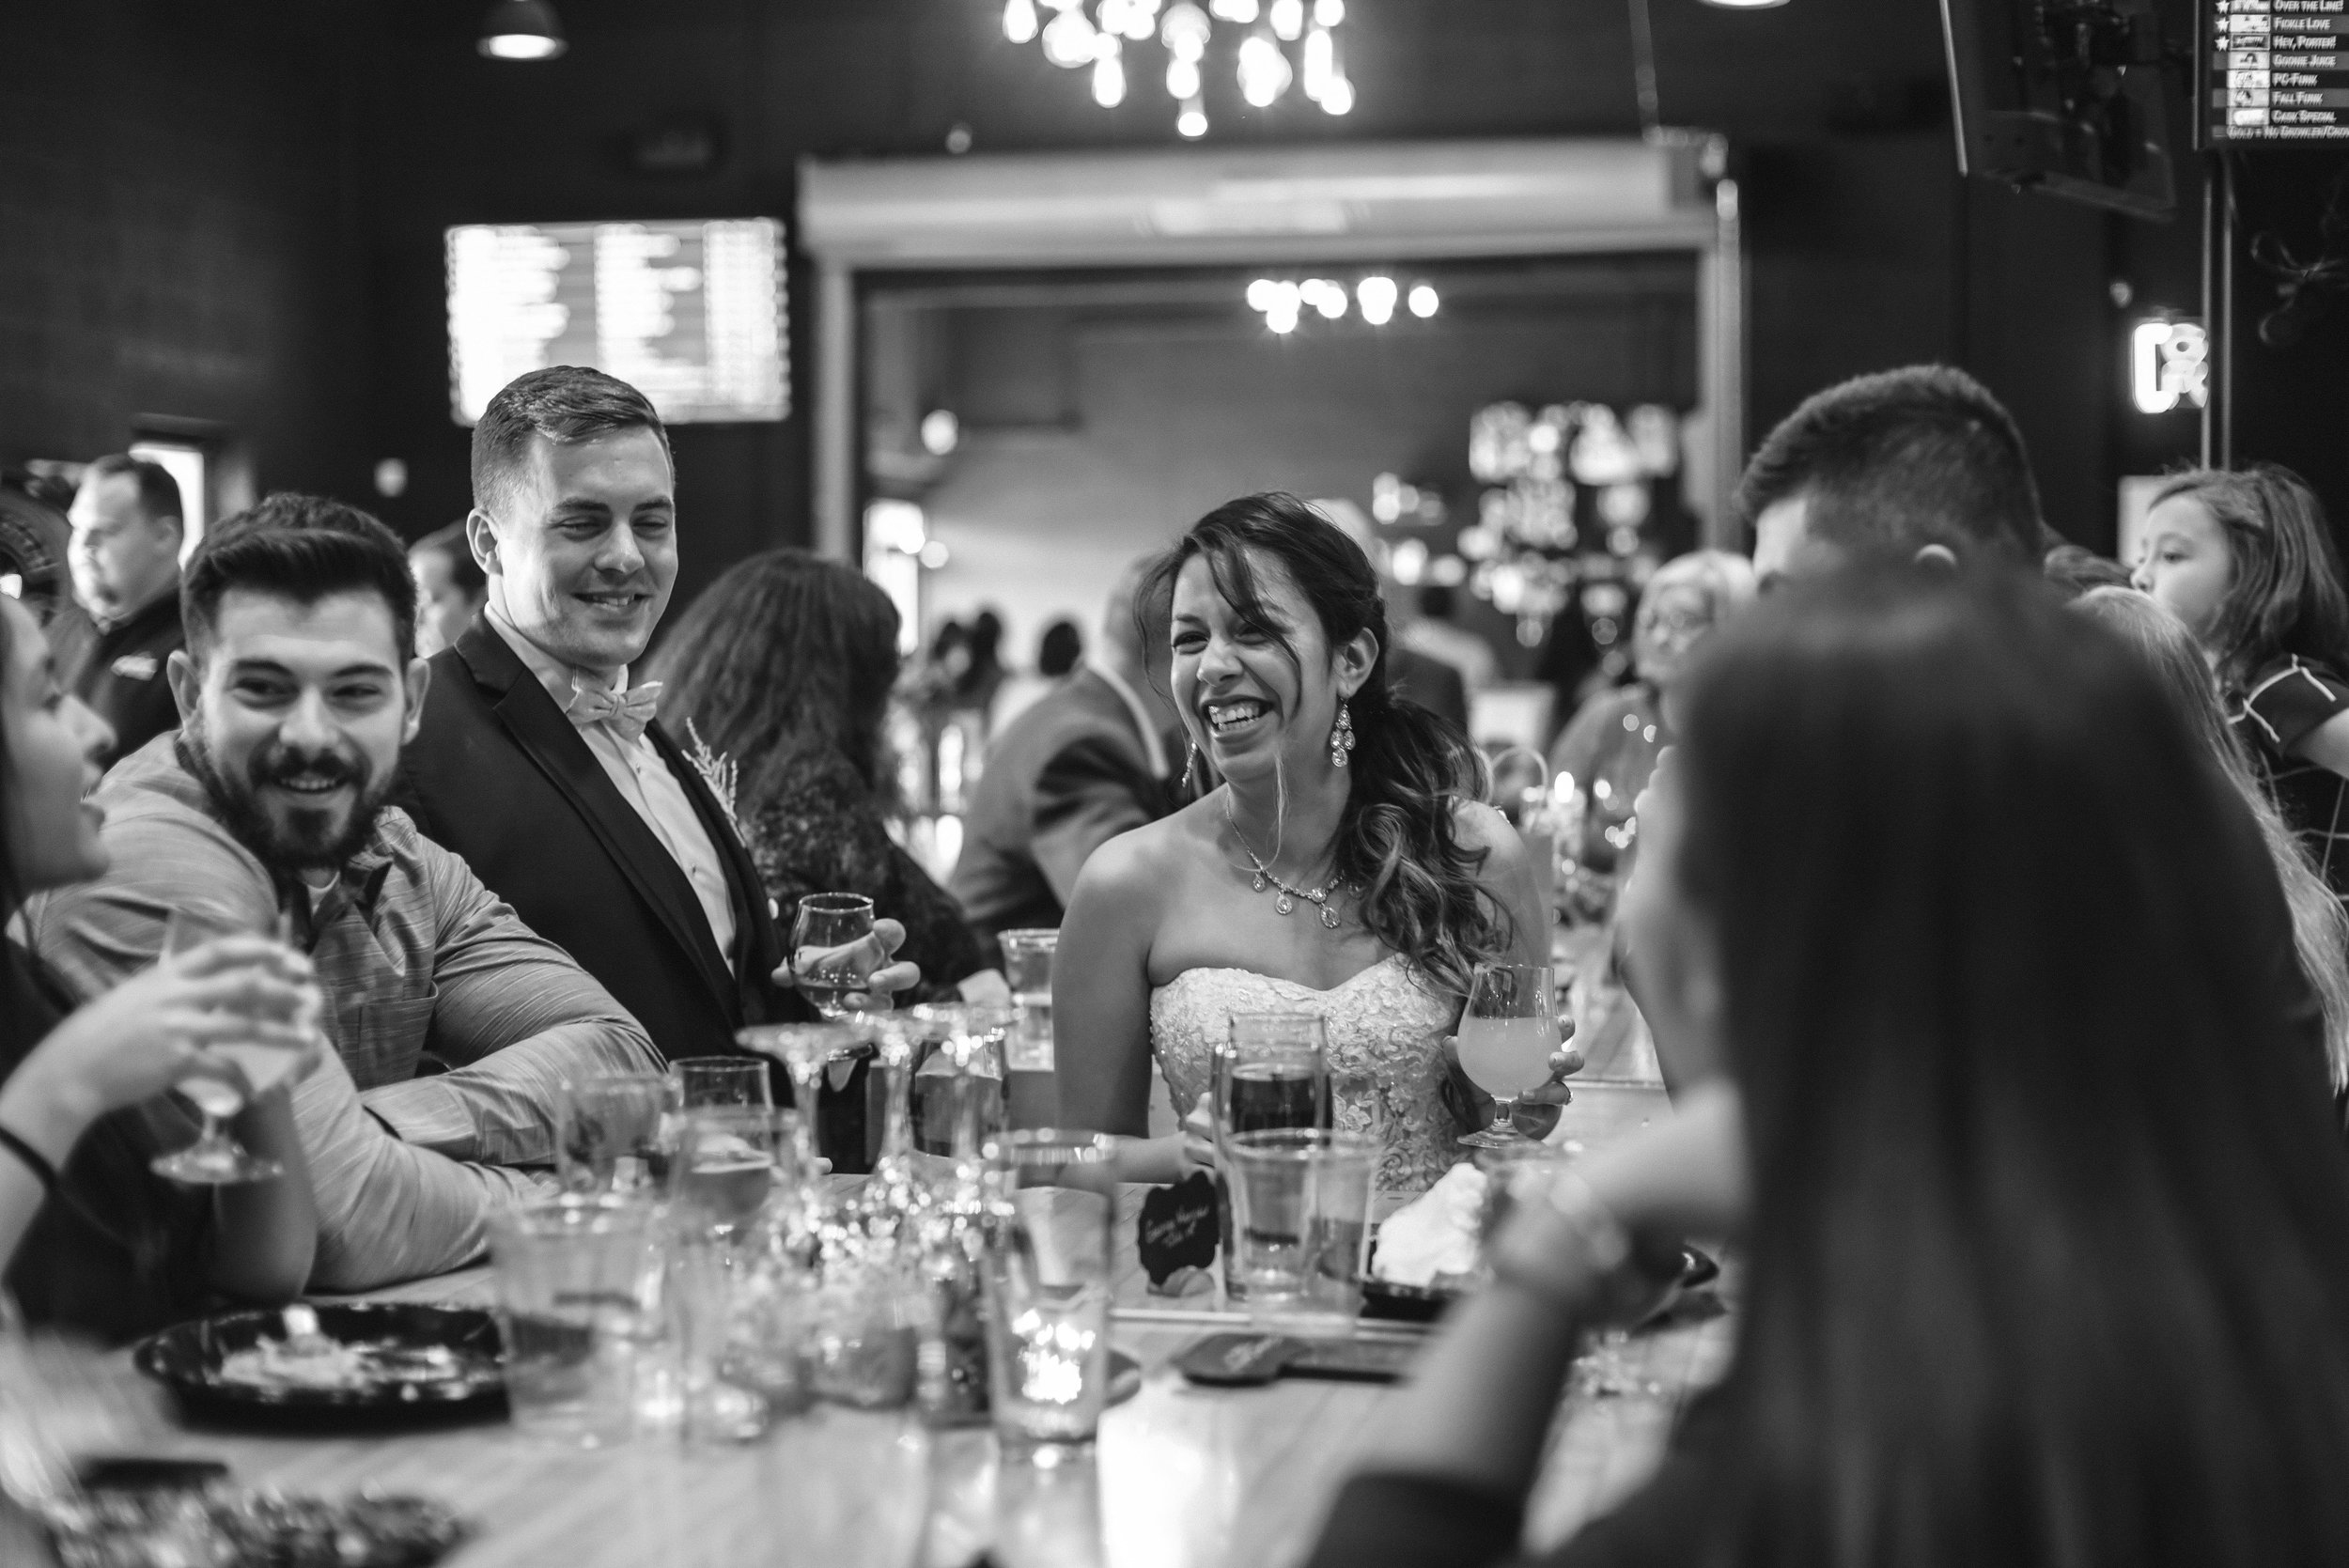 maryland_wedding_photographer_jailbreak_brewing_company-112.jpg